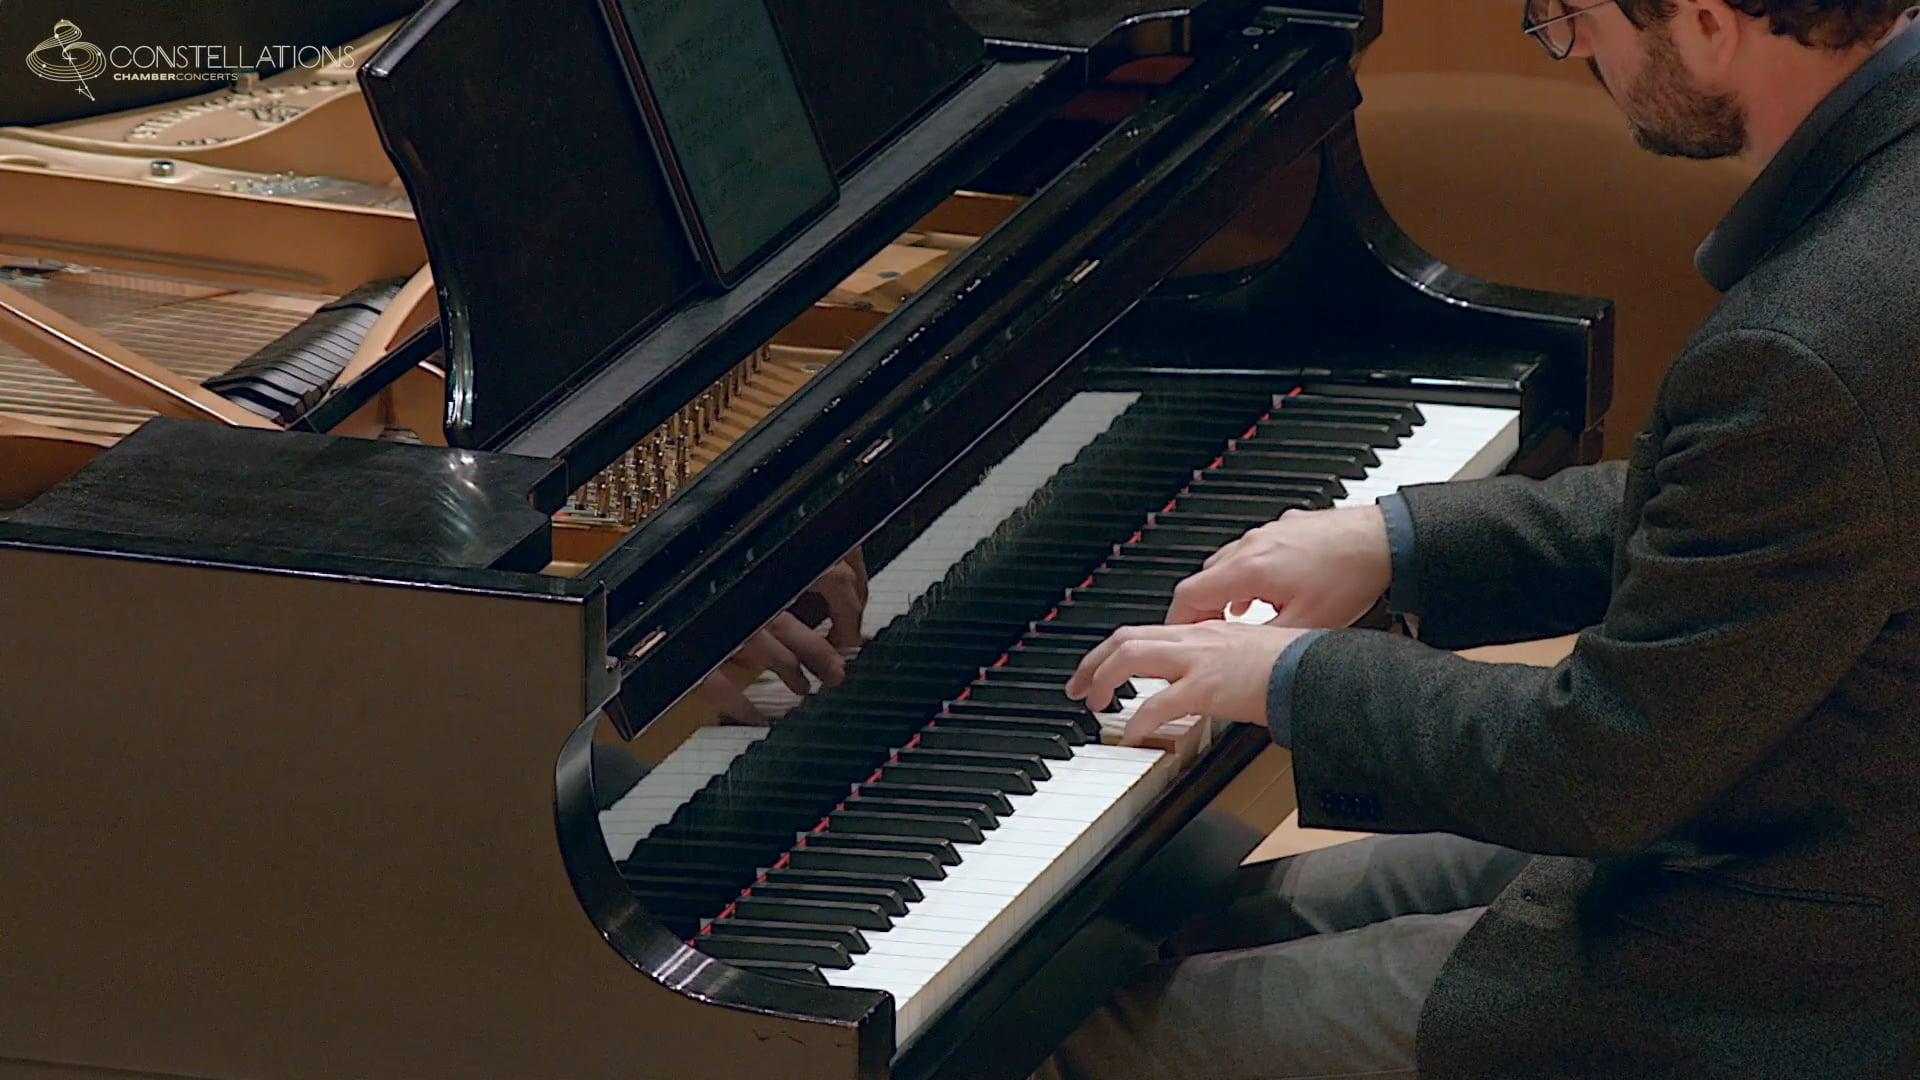 Daniel Pesca - Corea: Children's Songs